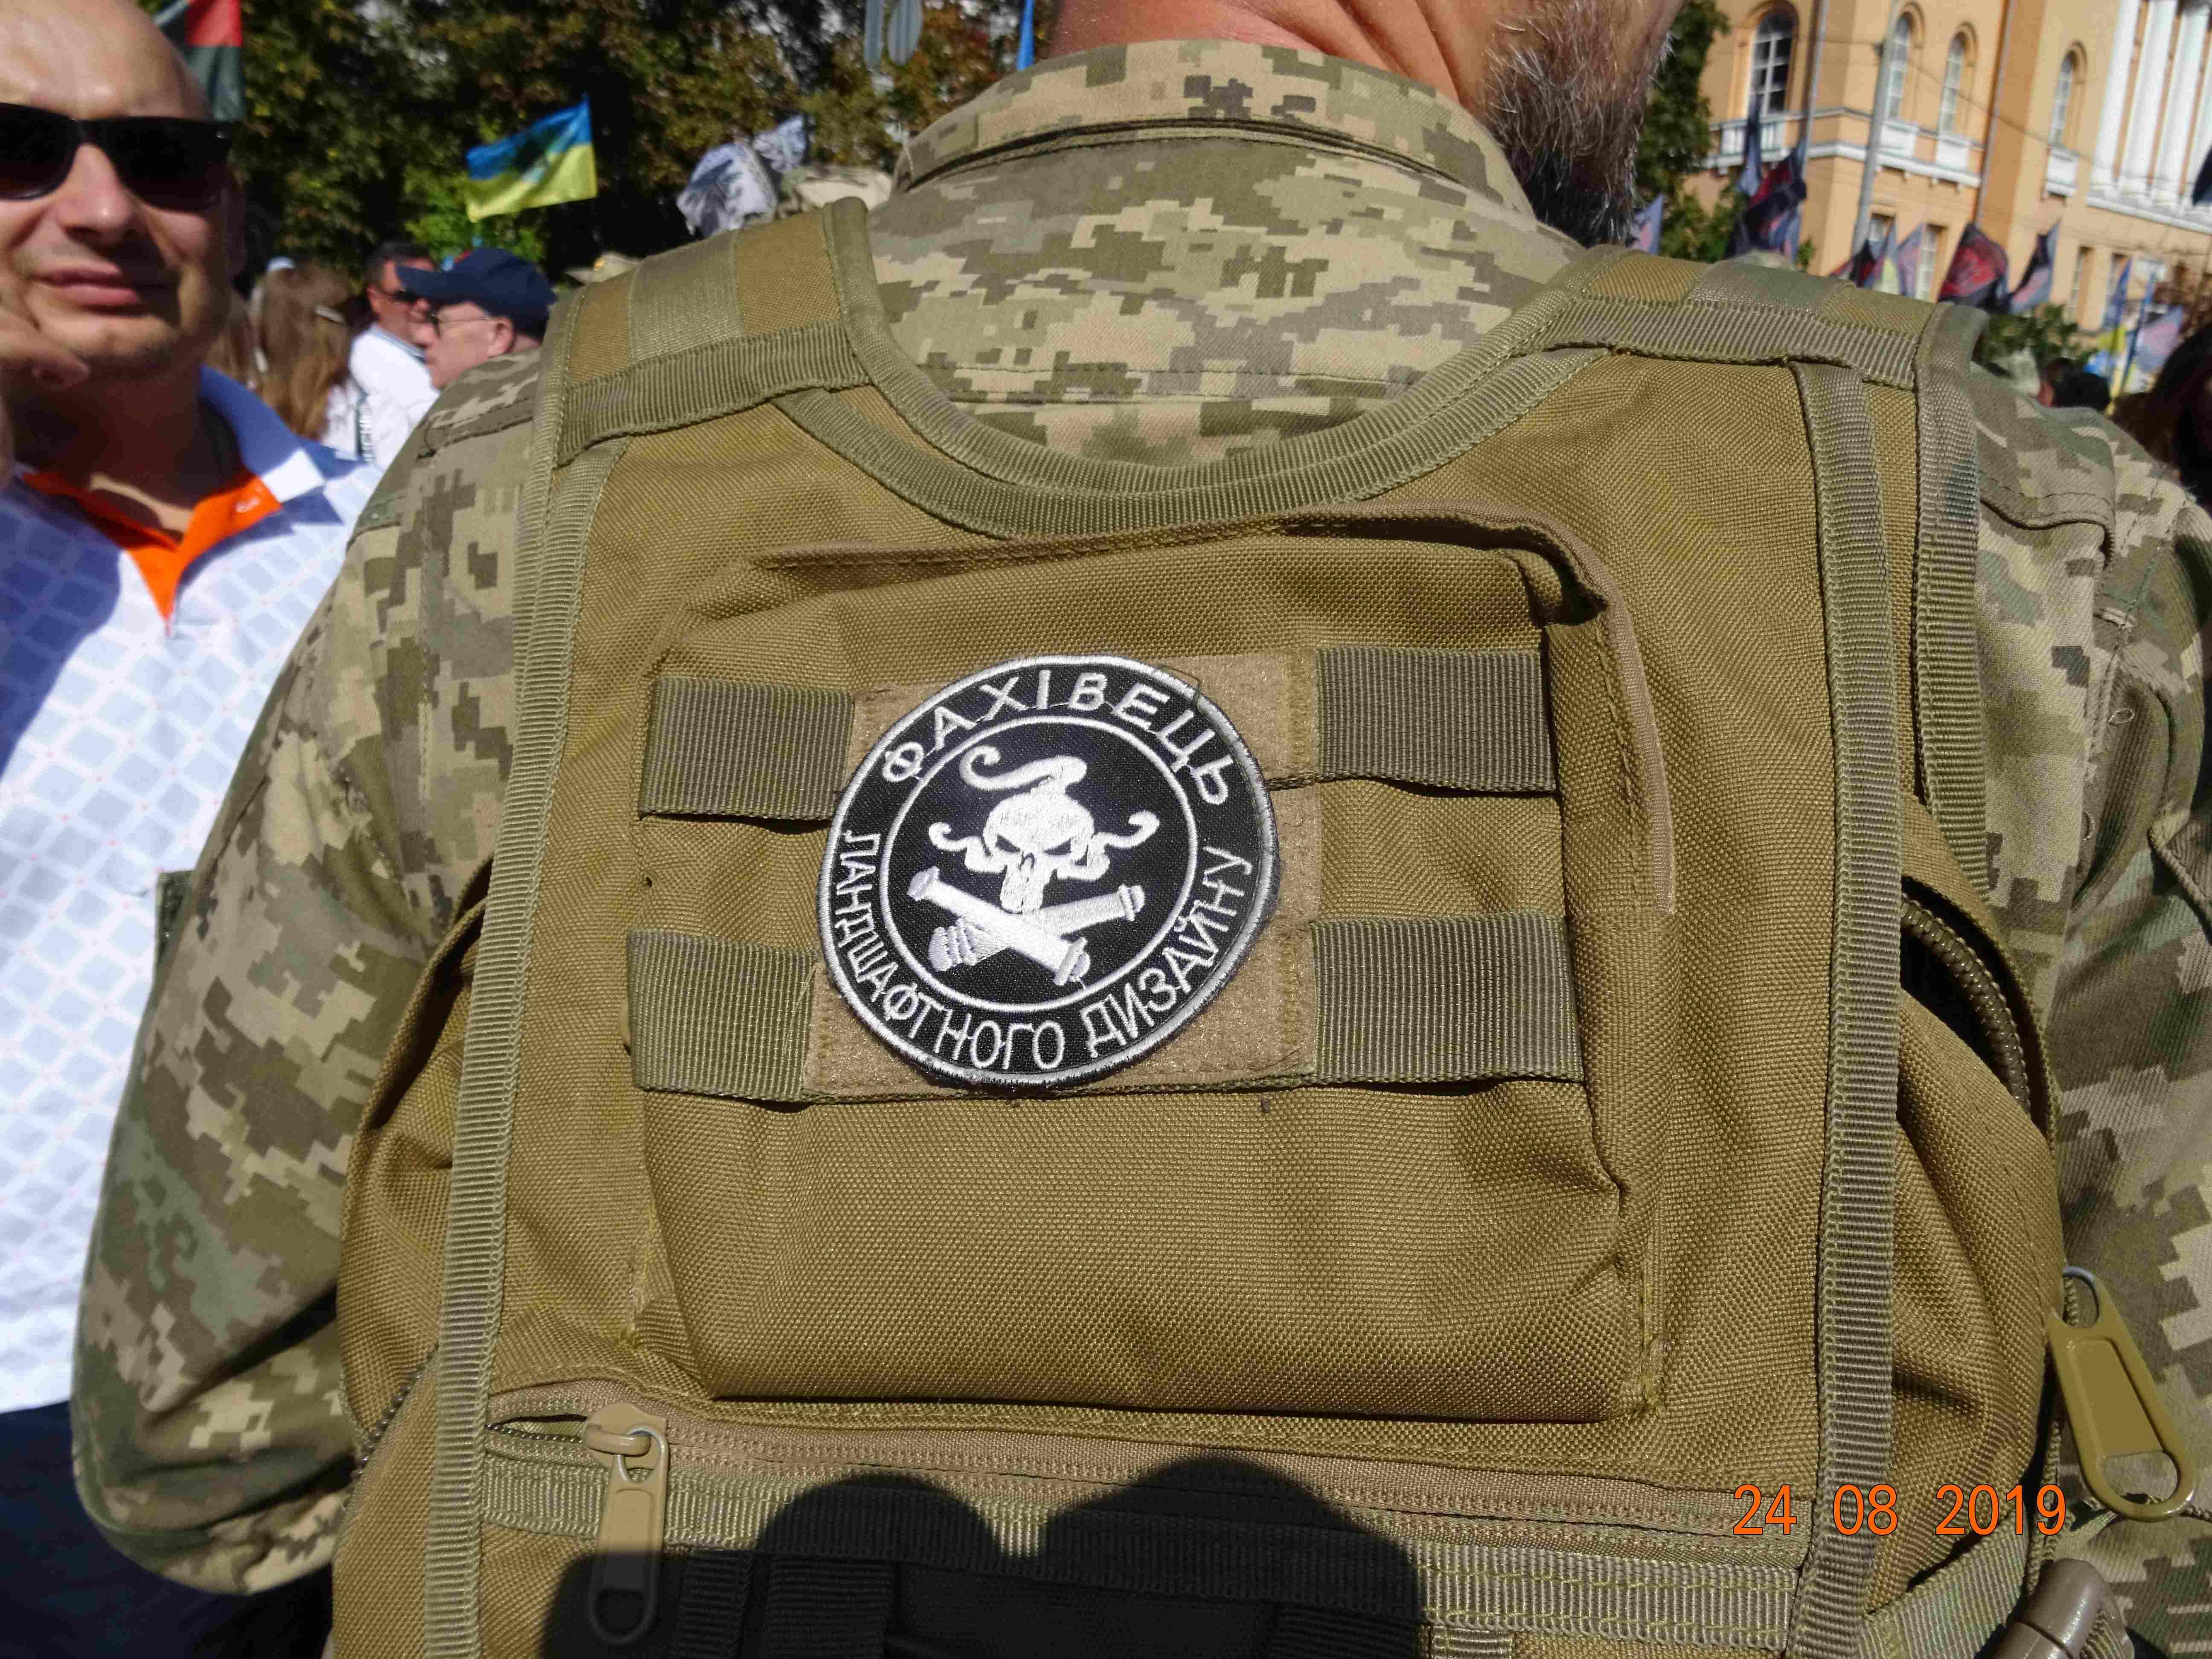 Defenders-of-Ukraine-Parad-24.Aug.19 - DSC06010.jpg